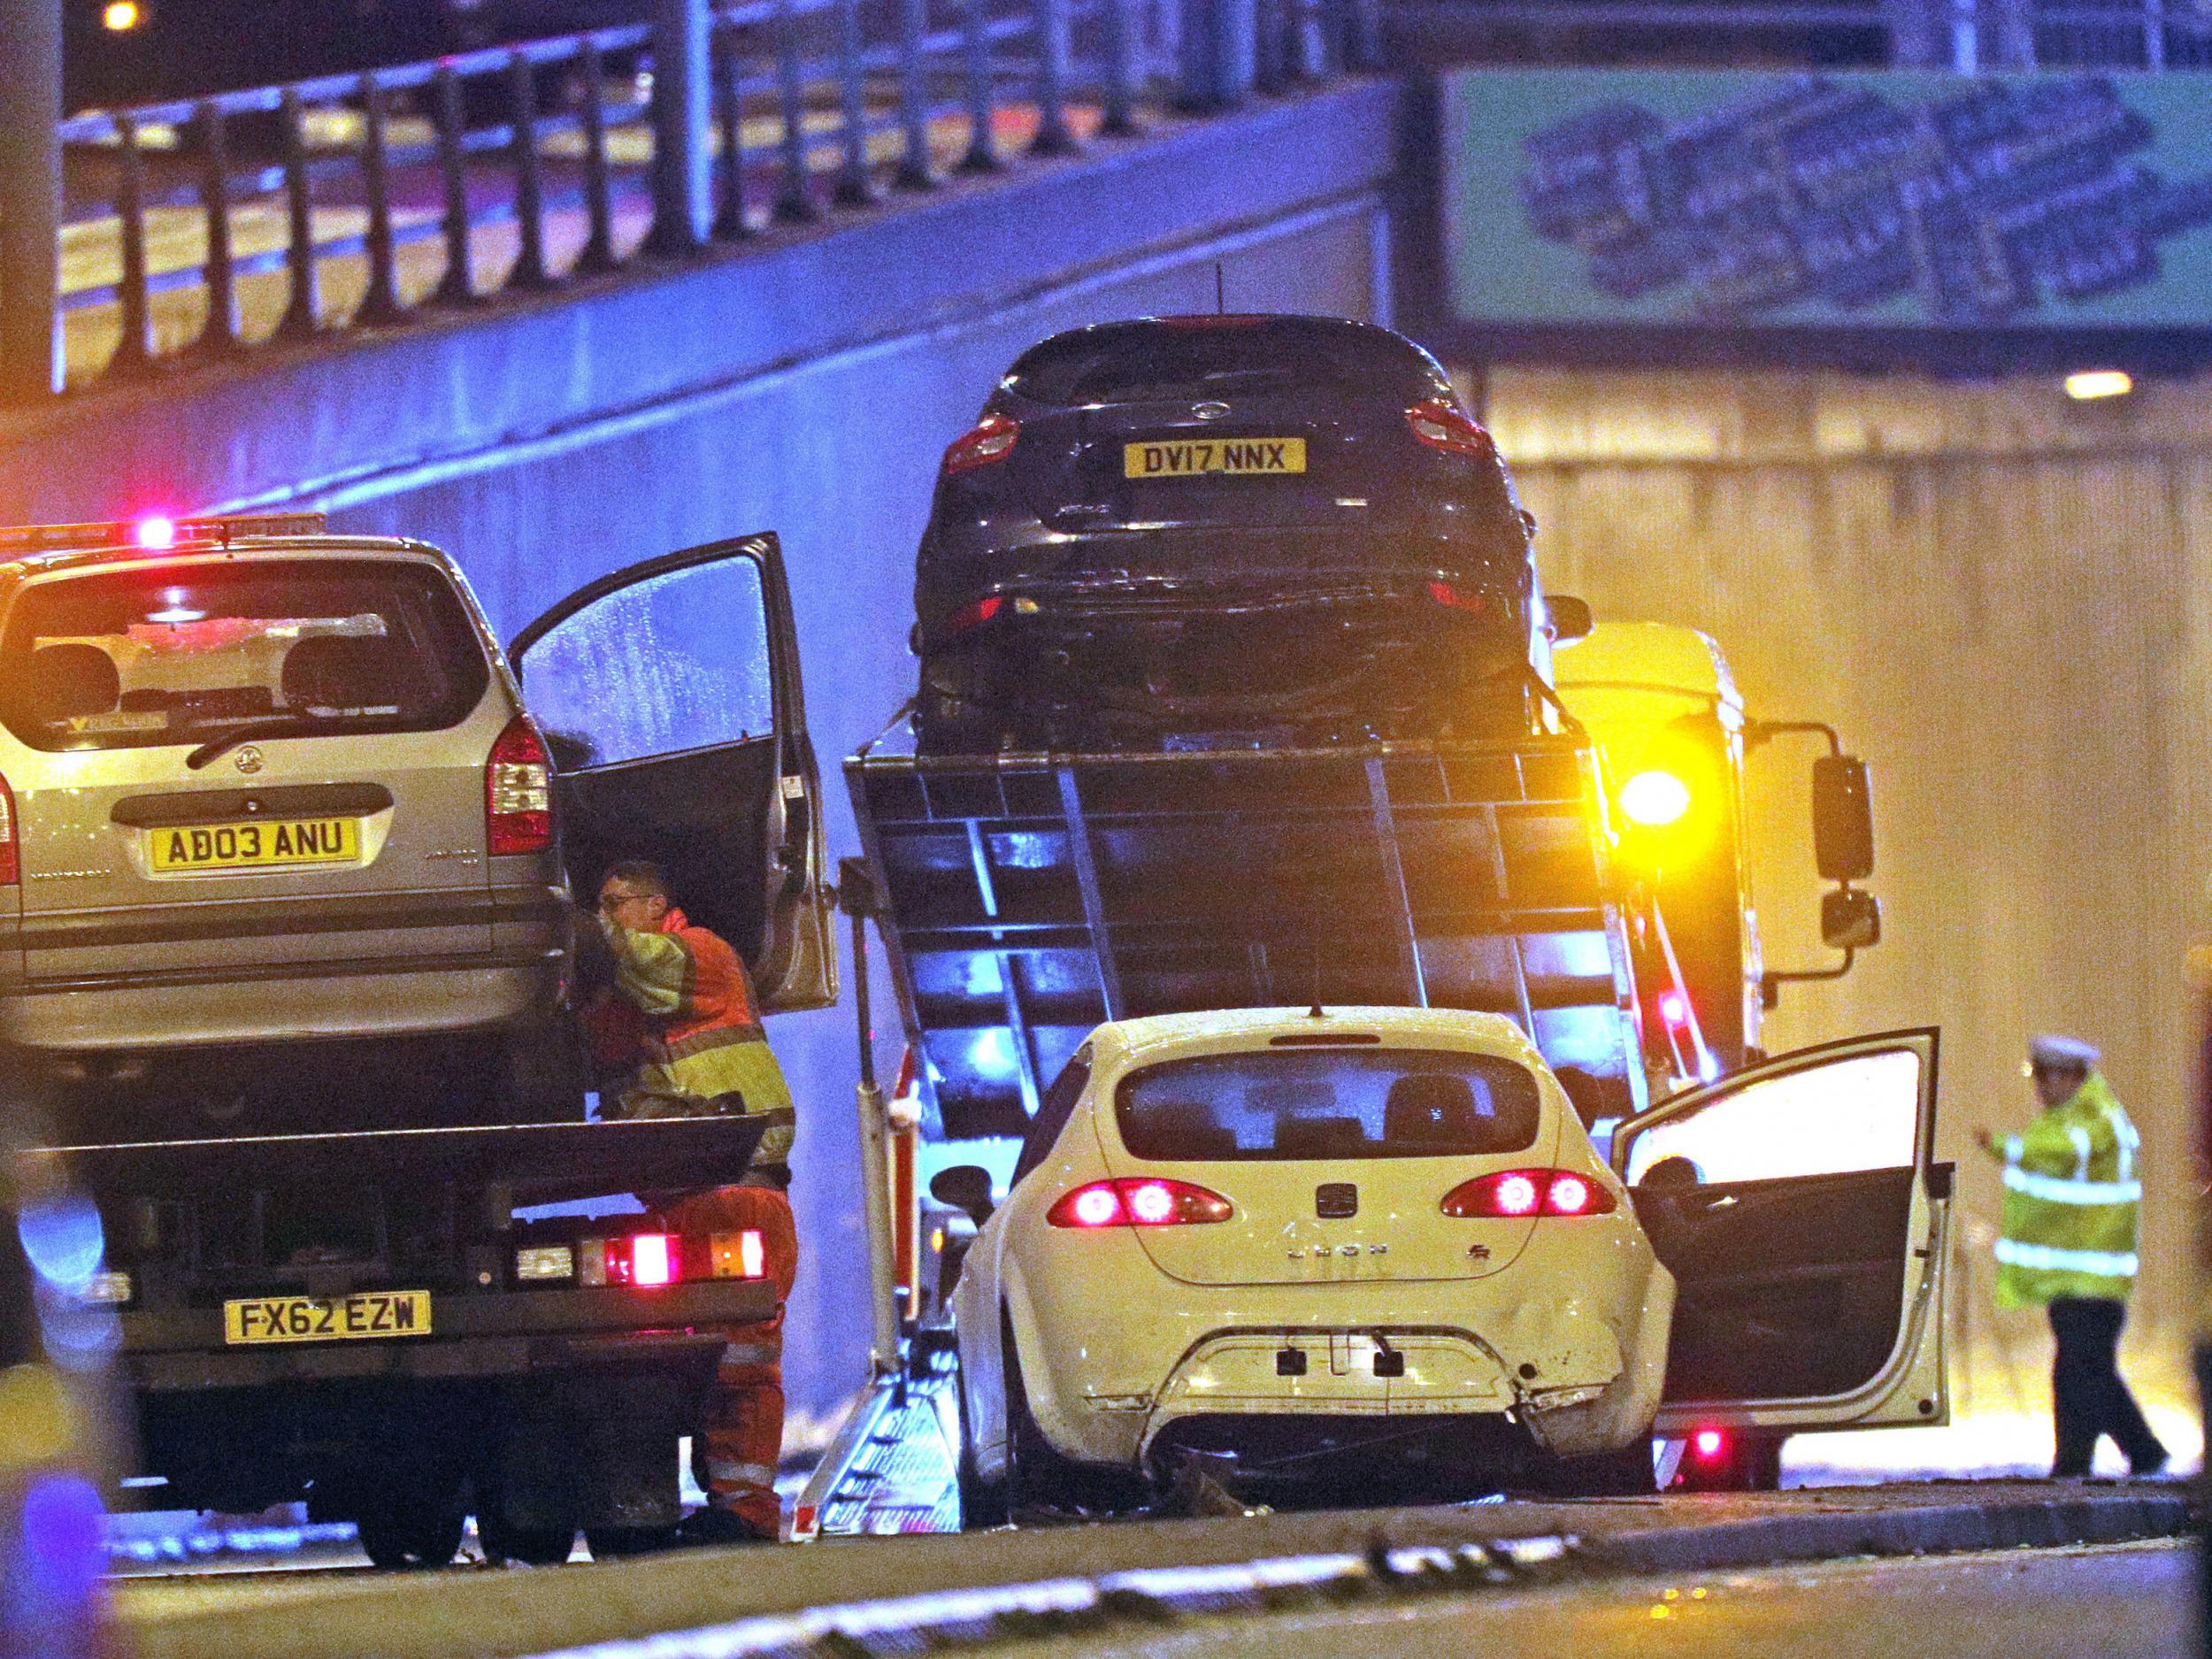 birmingham car crash latest: two more victims of multiple-vehicle